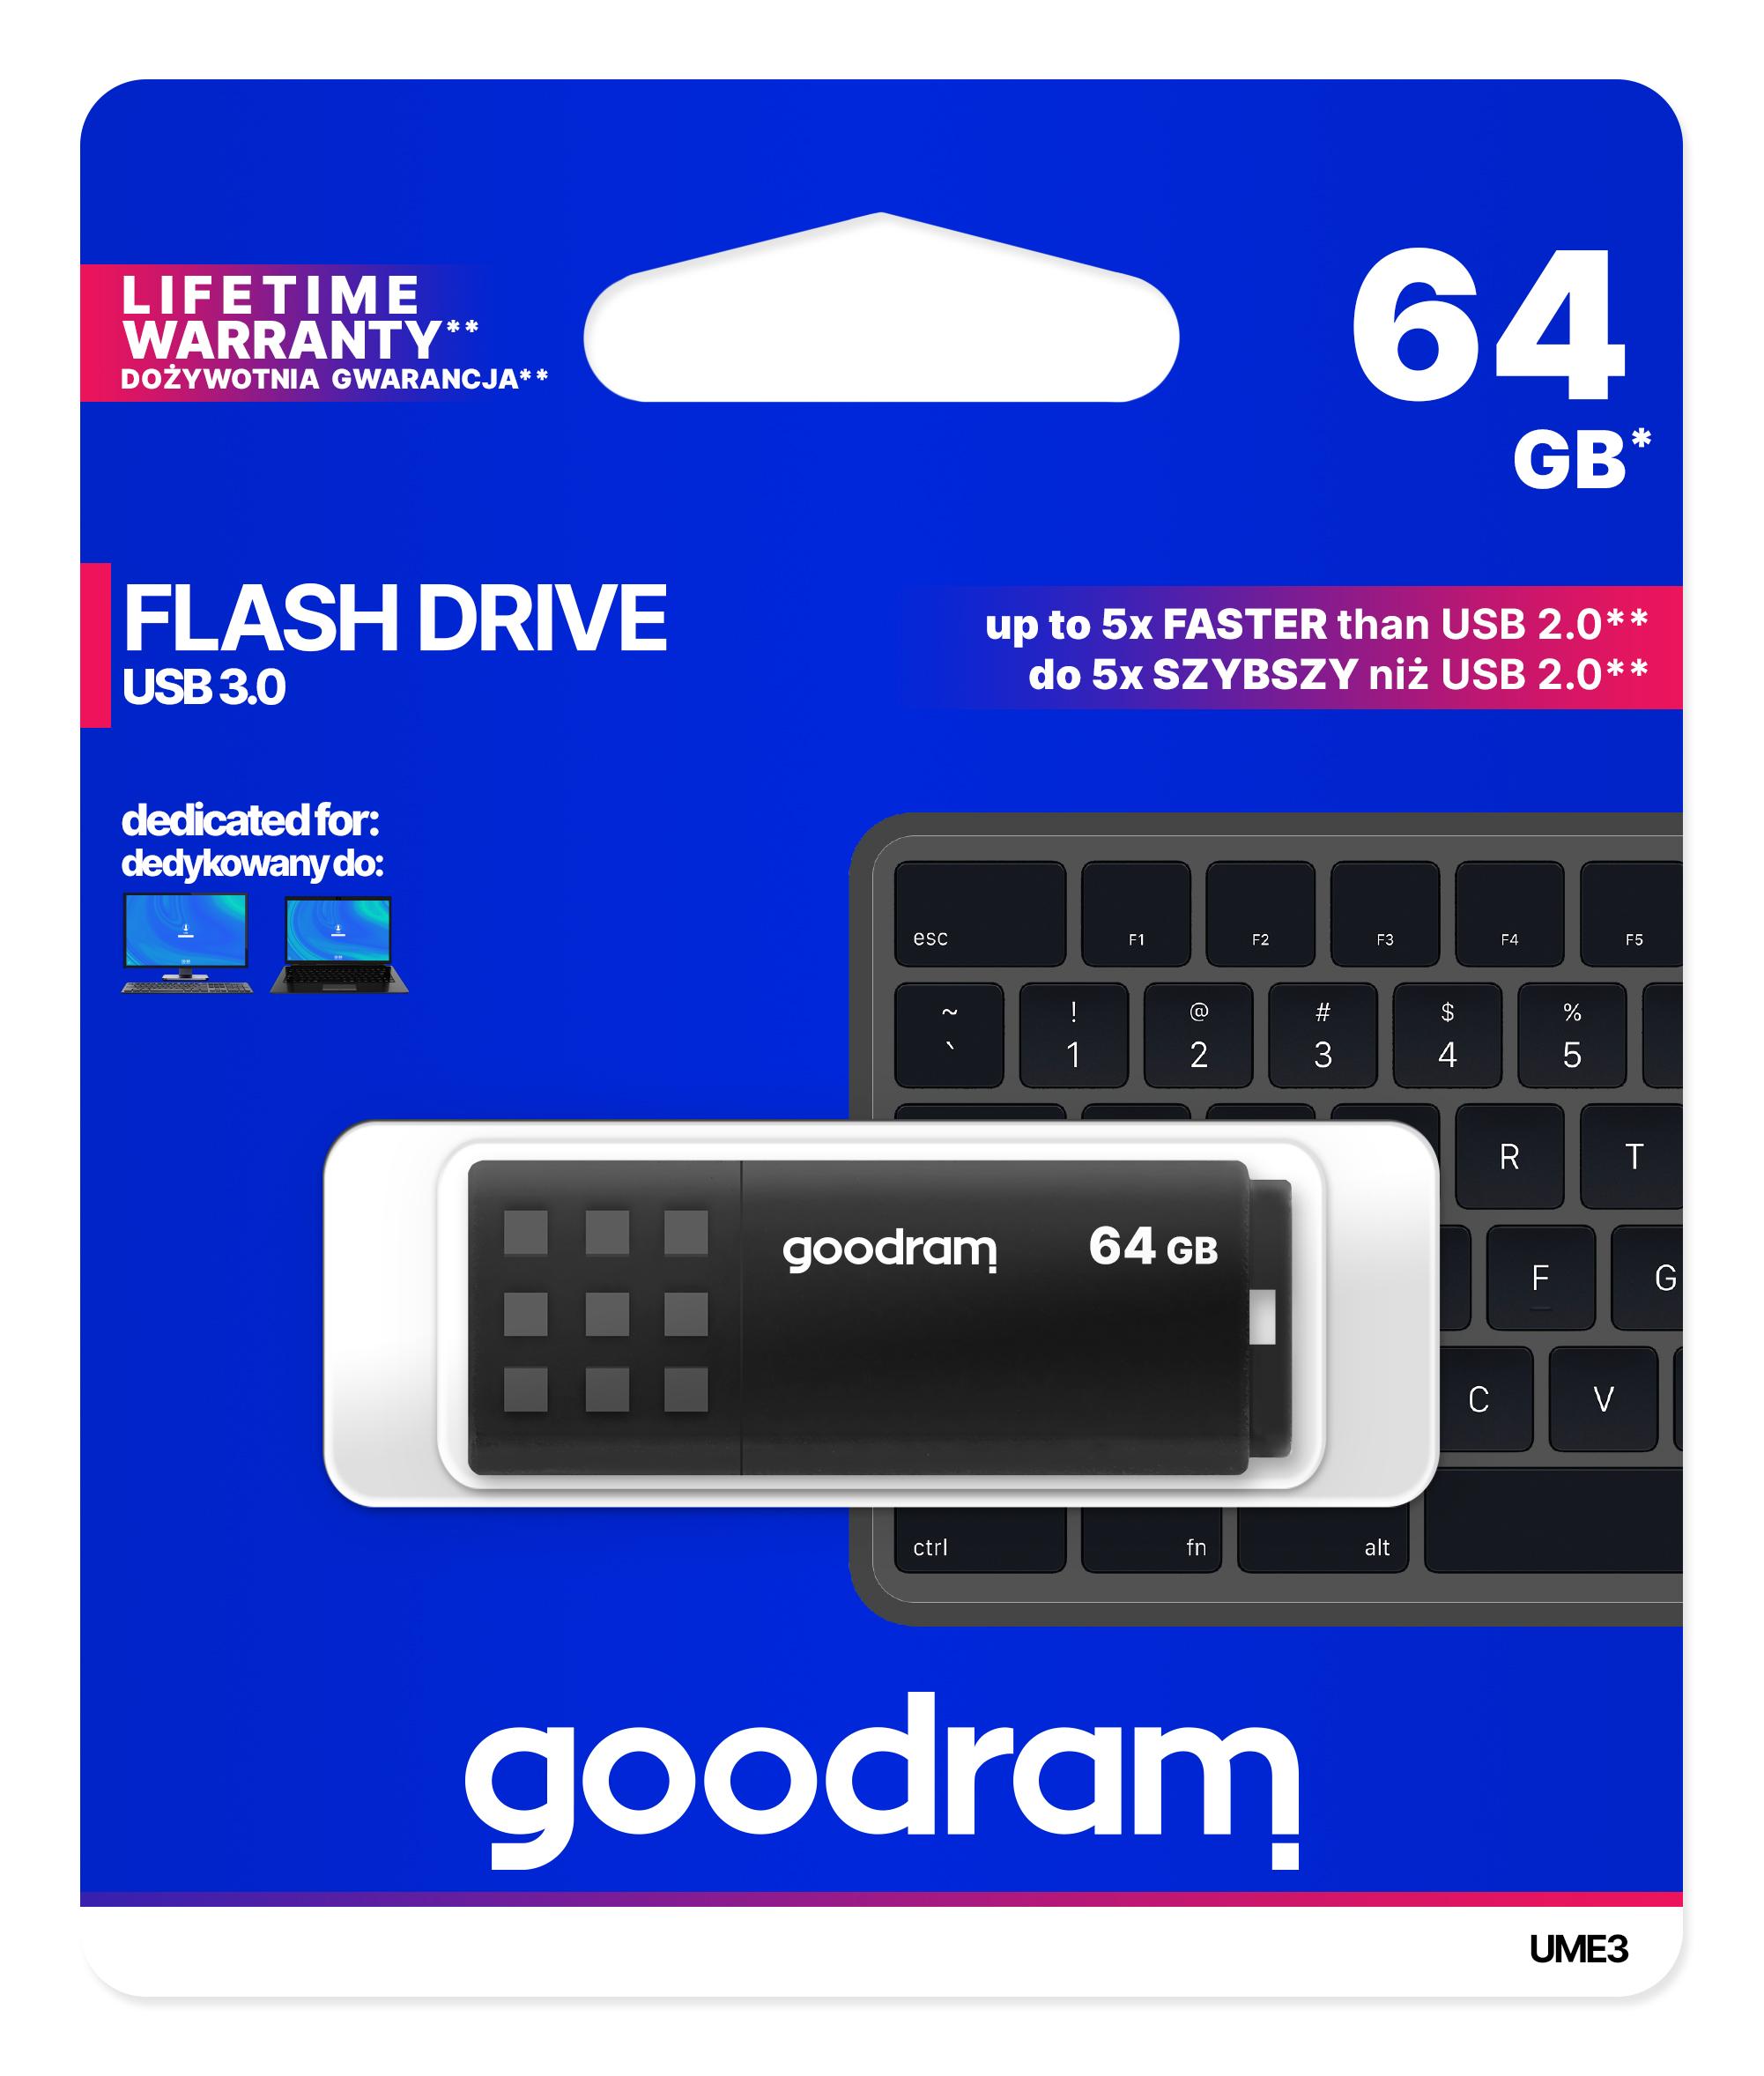 GOODRAM USB3.0 Flash Drive, 64 GB, UME3, USB A connector, Black, 60/20 MB/s (USB3/2/1.1 comp)